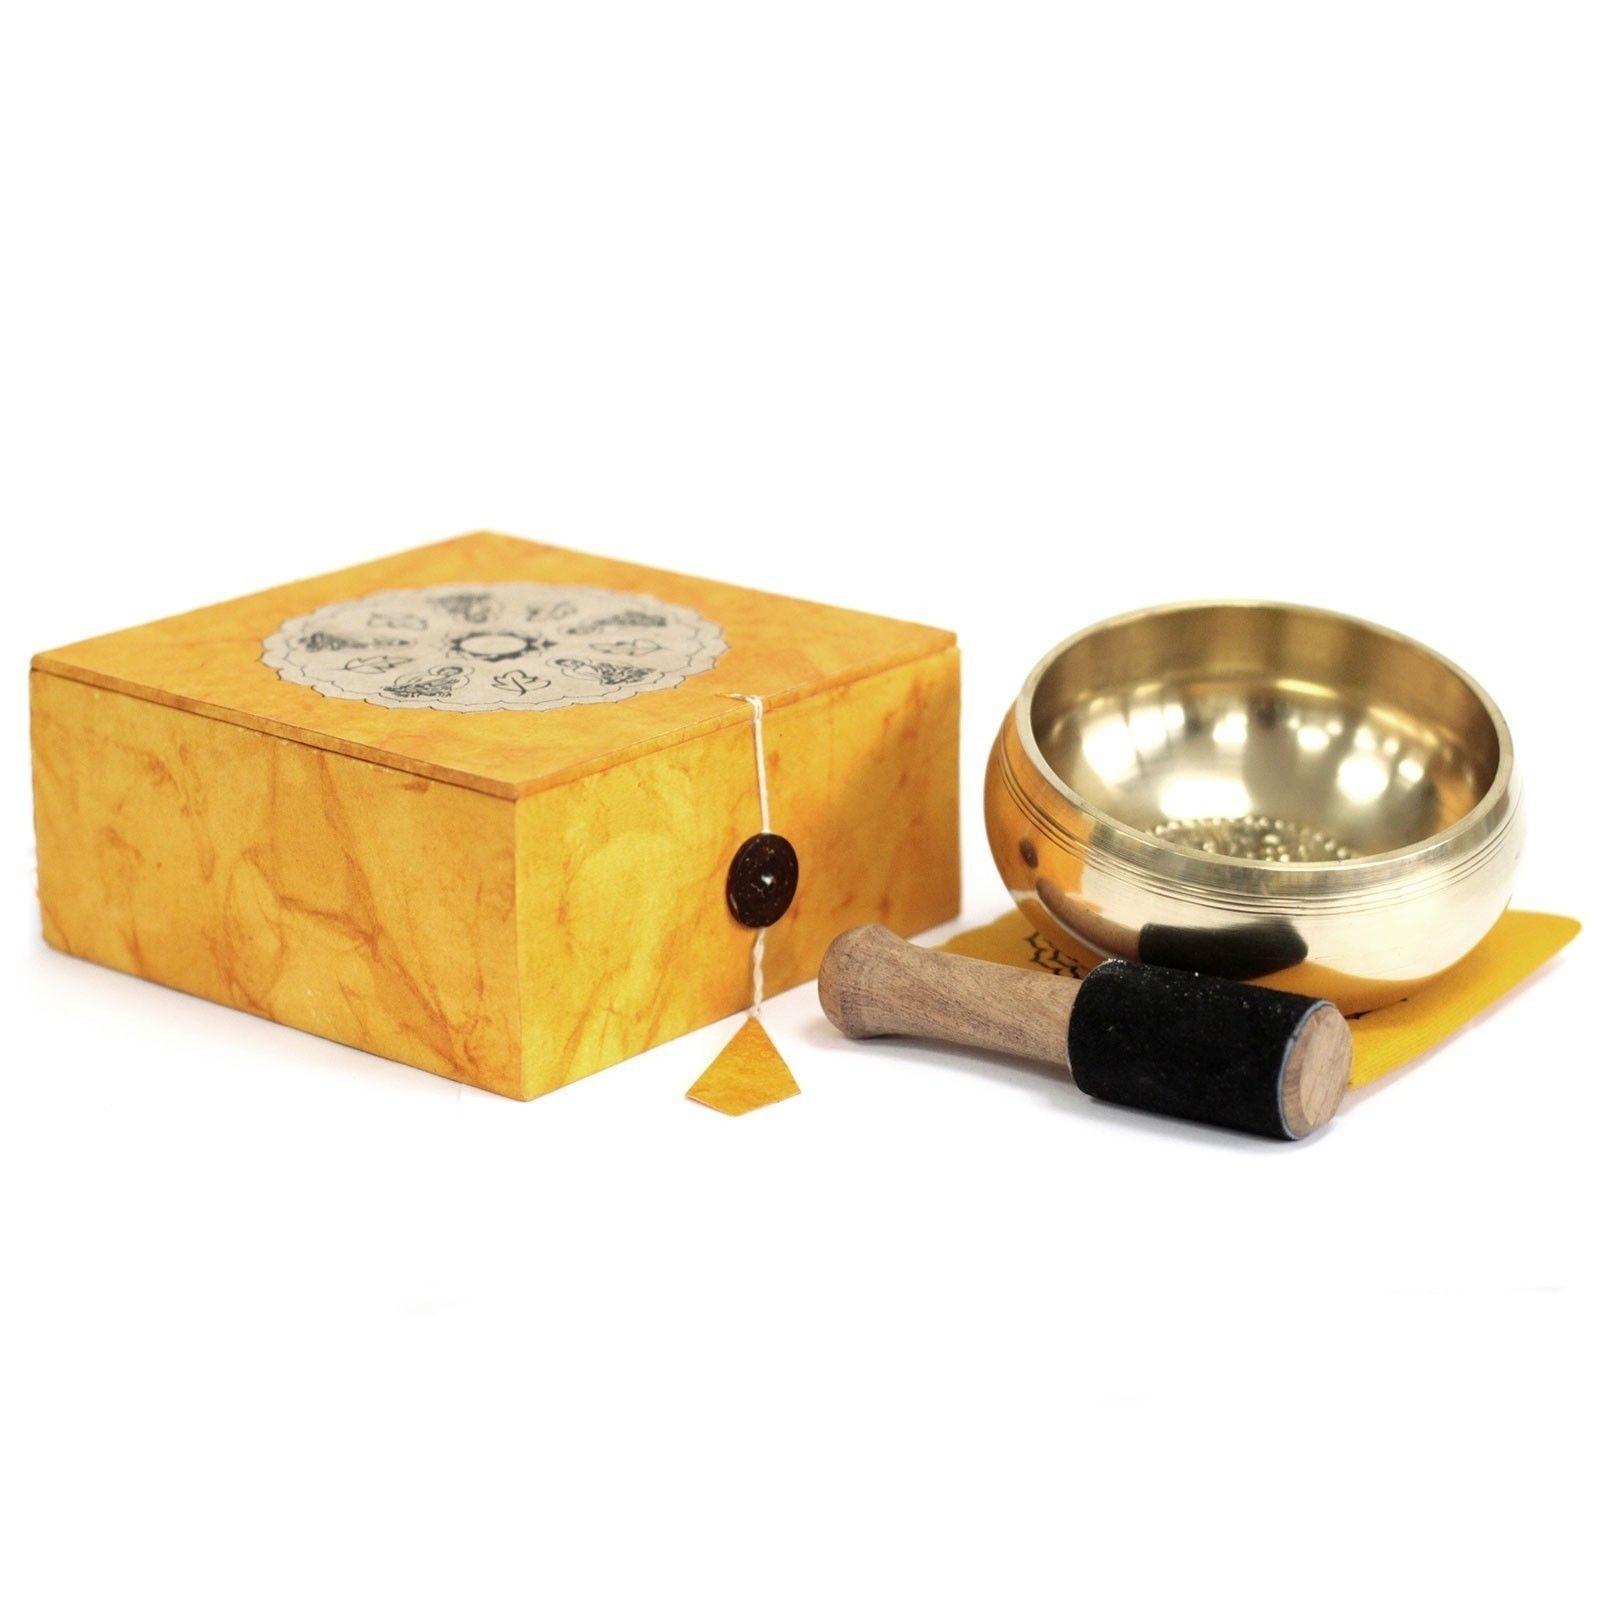 Tibetan Special Meditation Singing Bowl